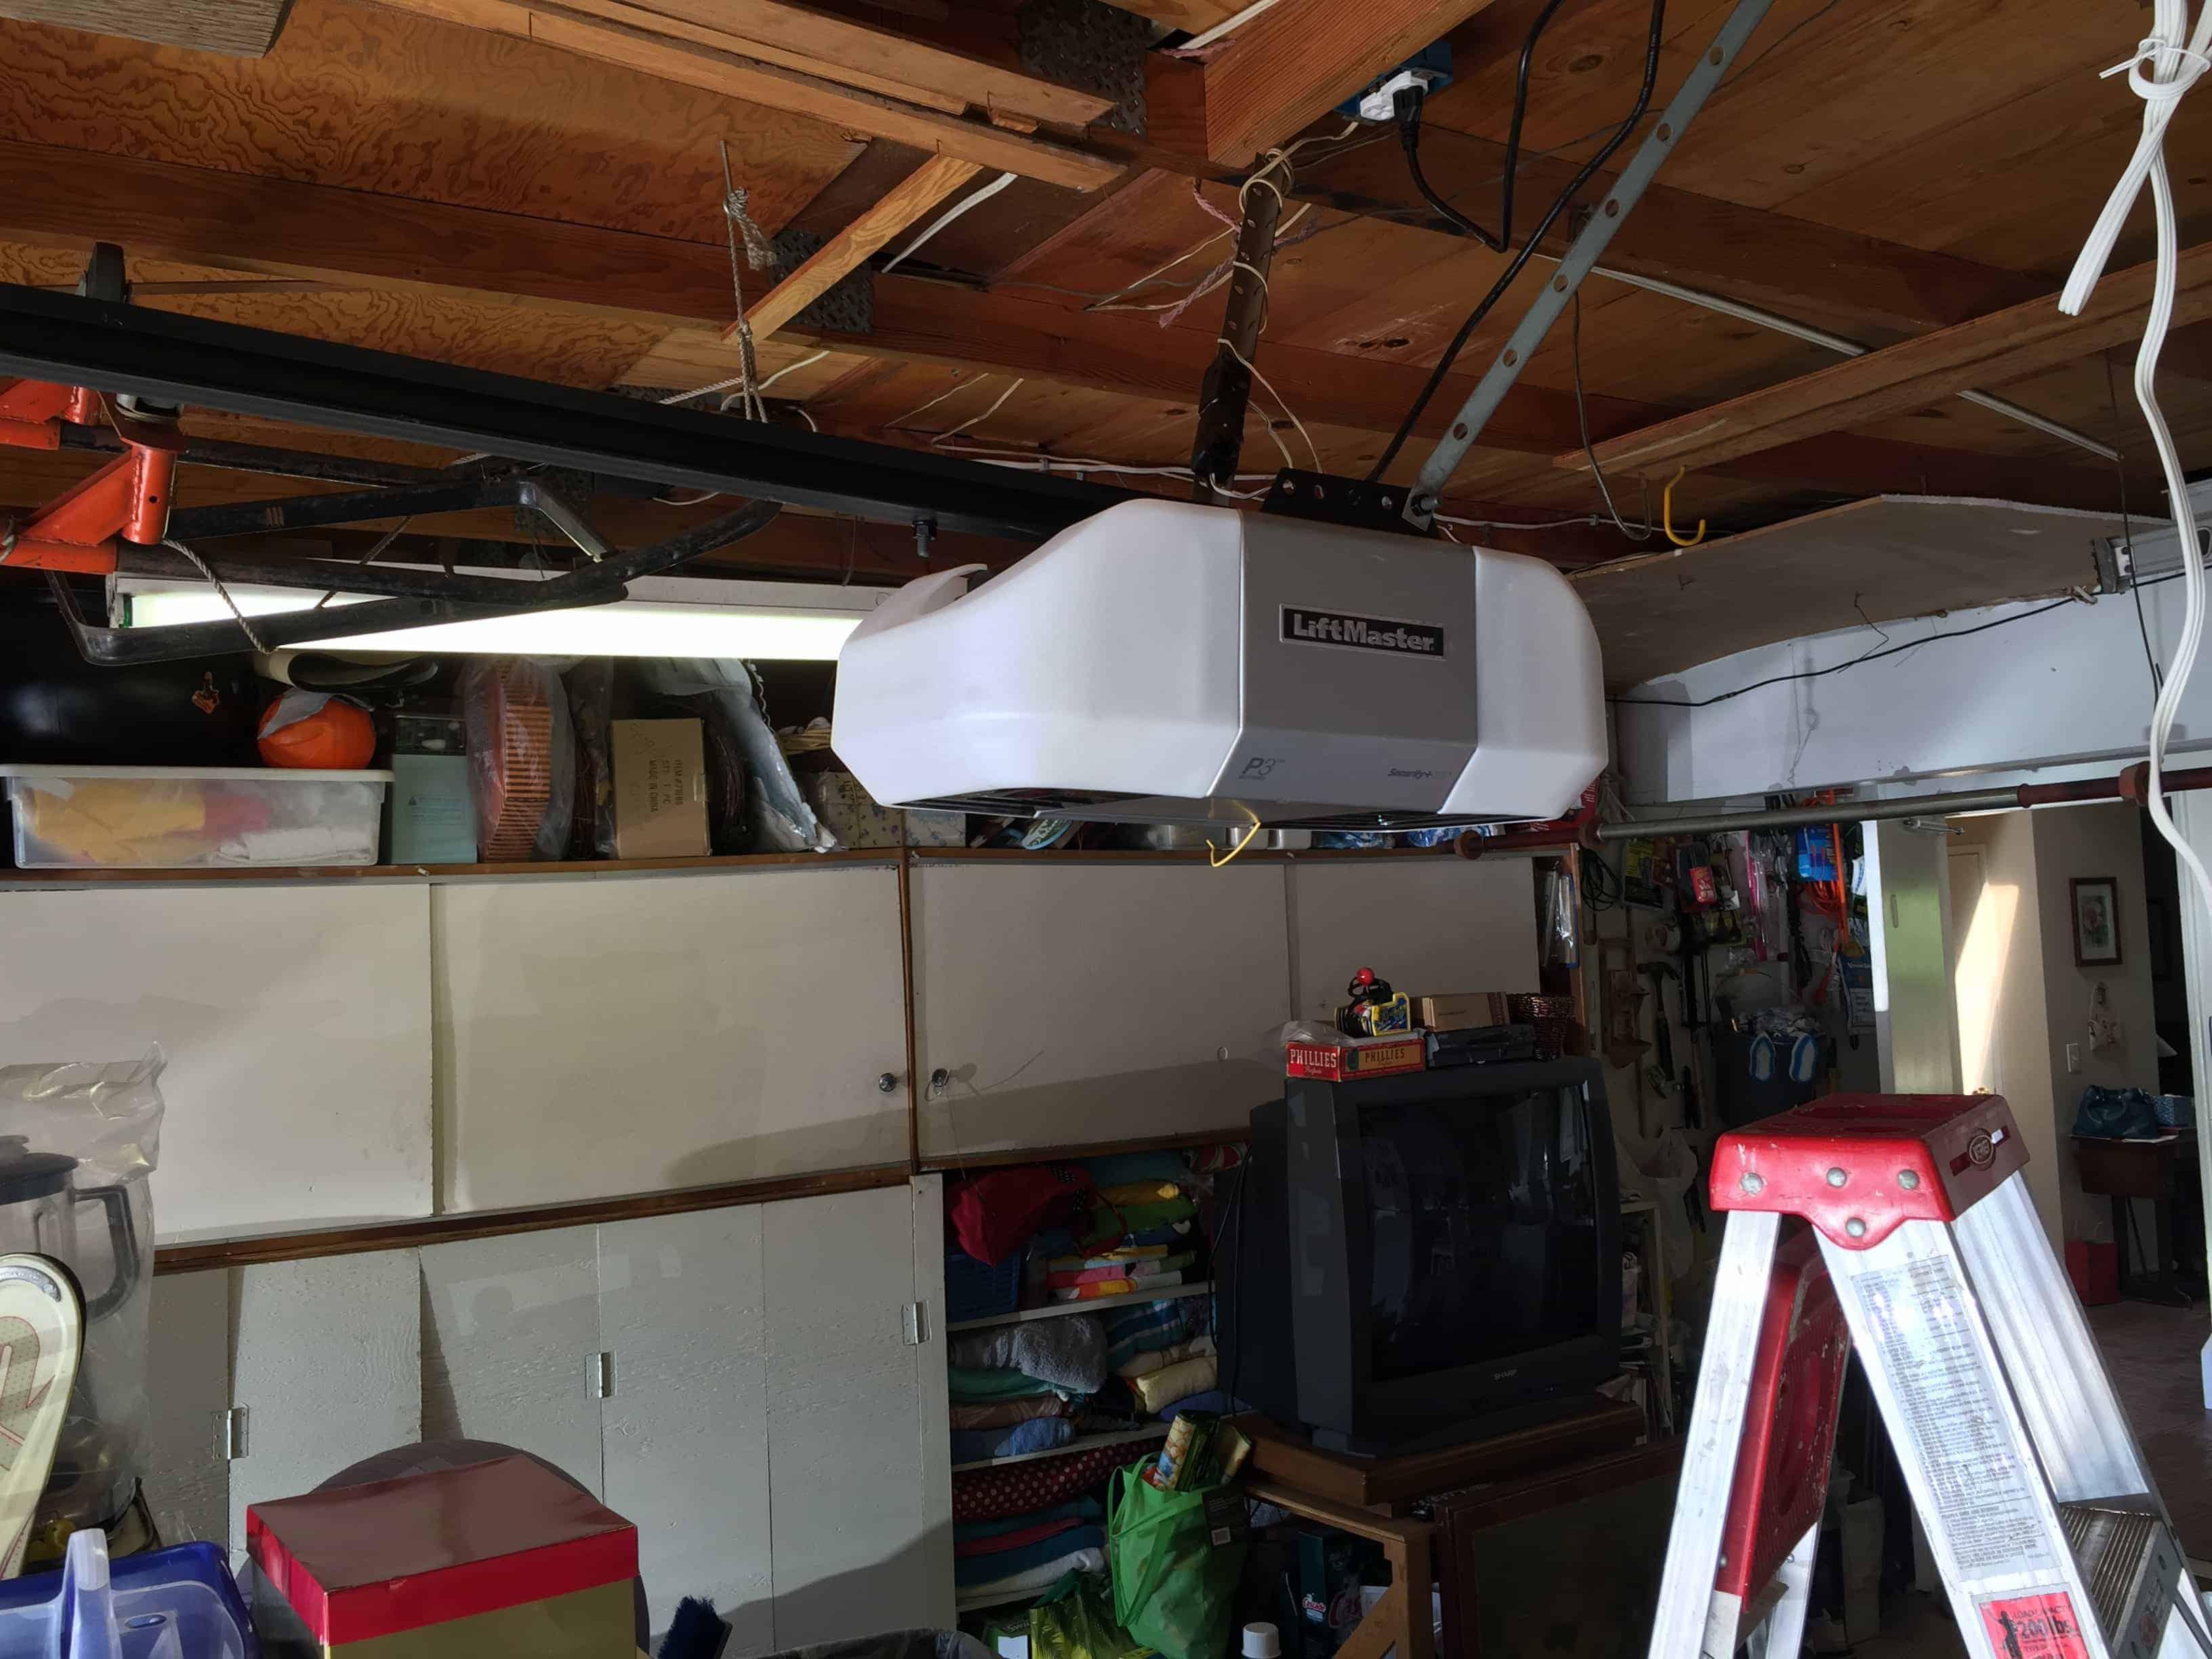 Los Altos Hills Garage door repair and replacement